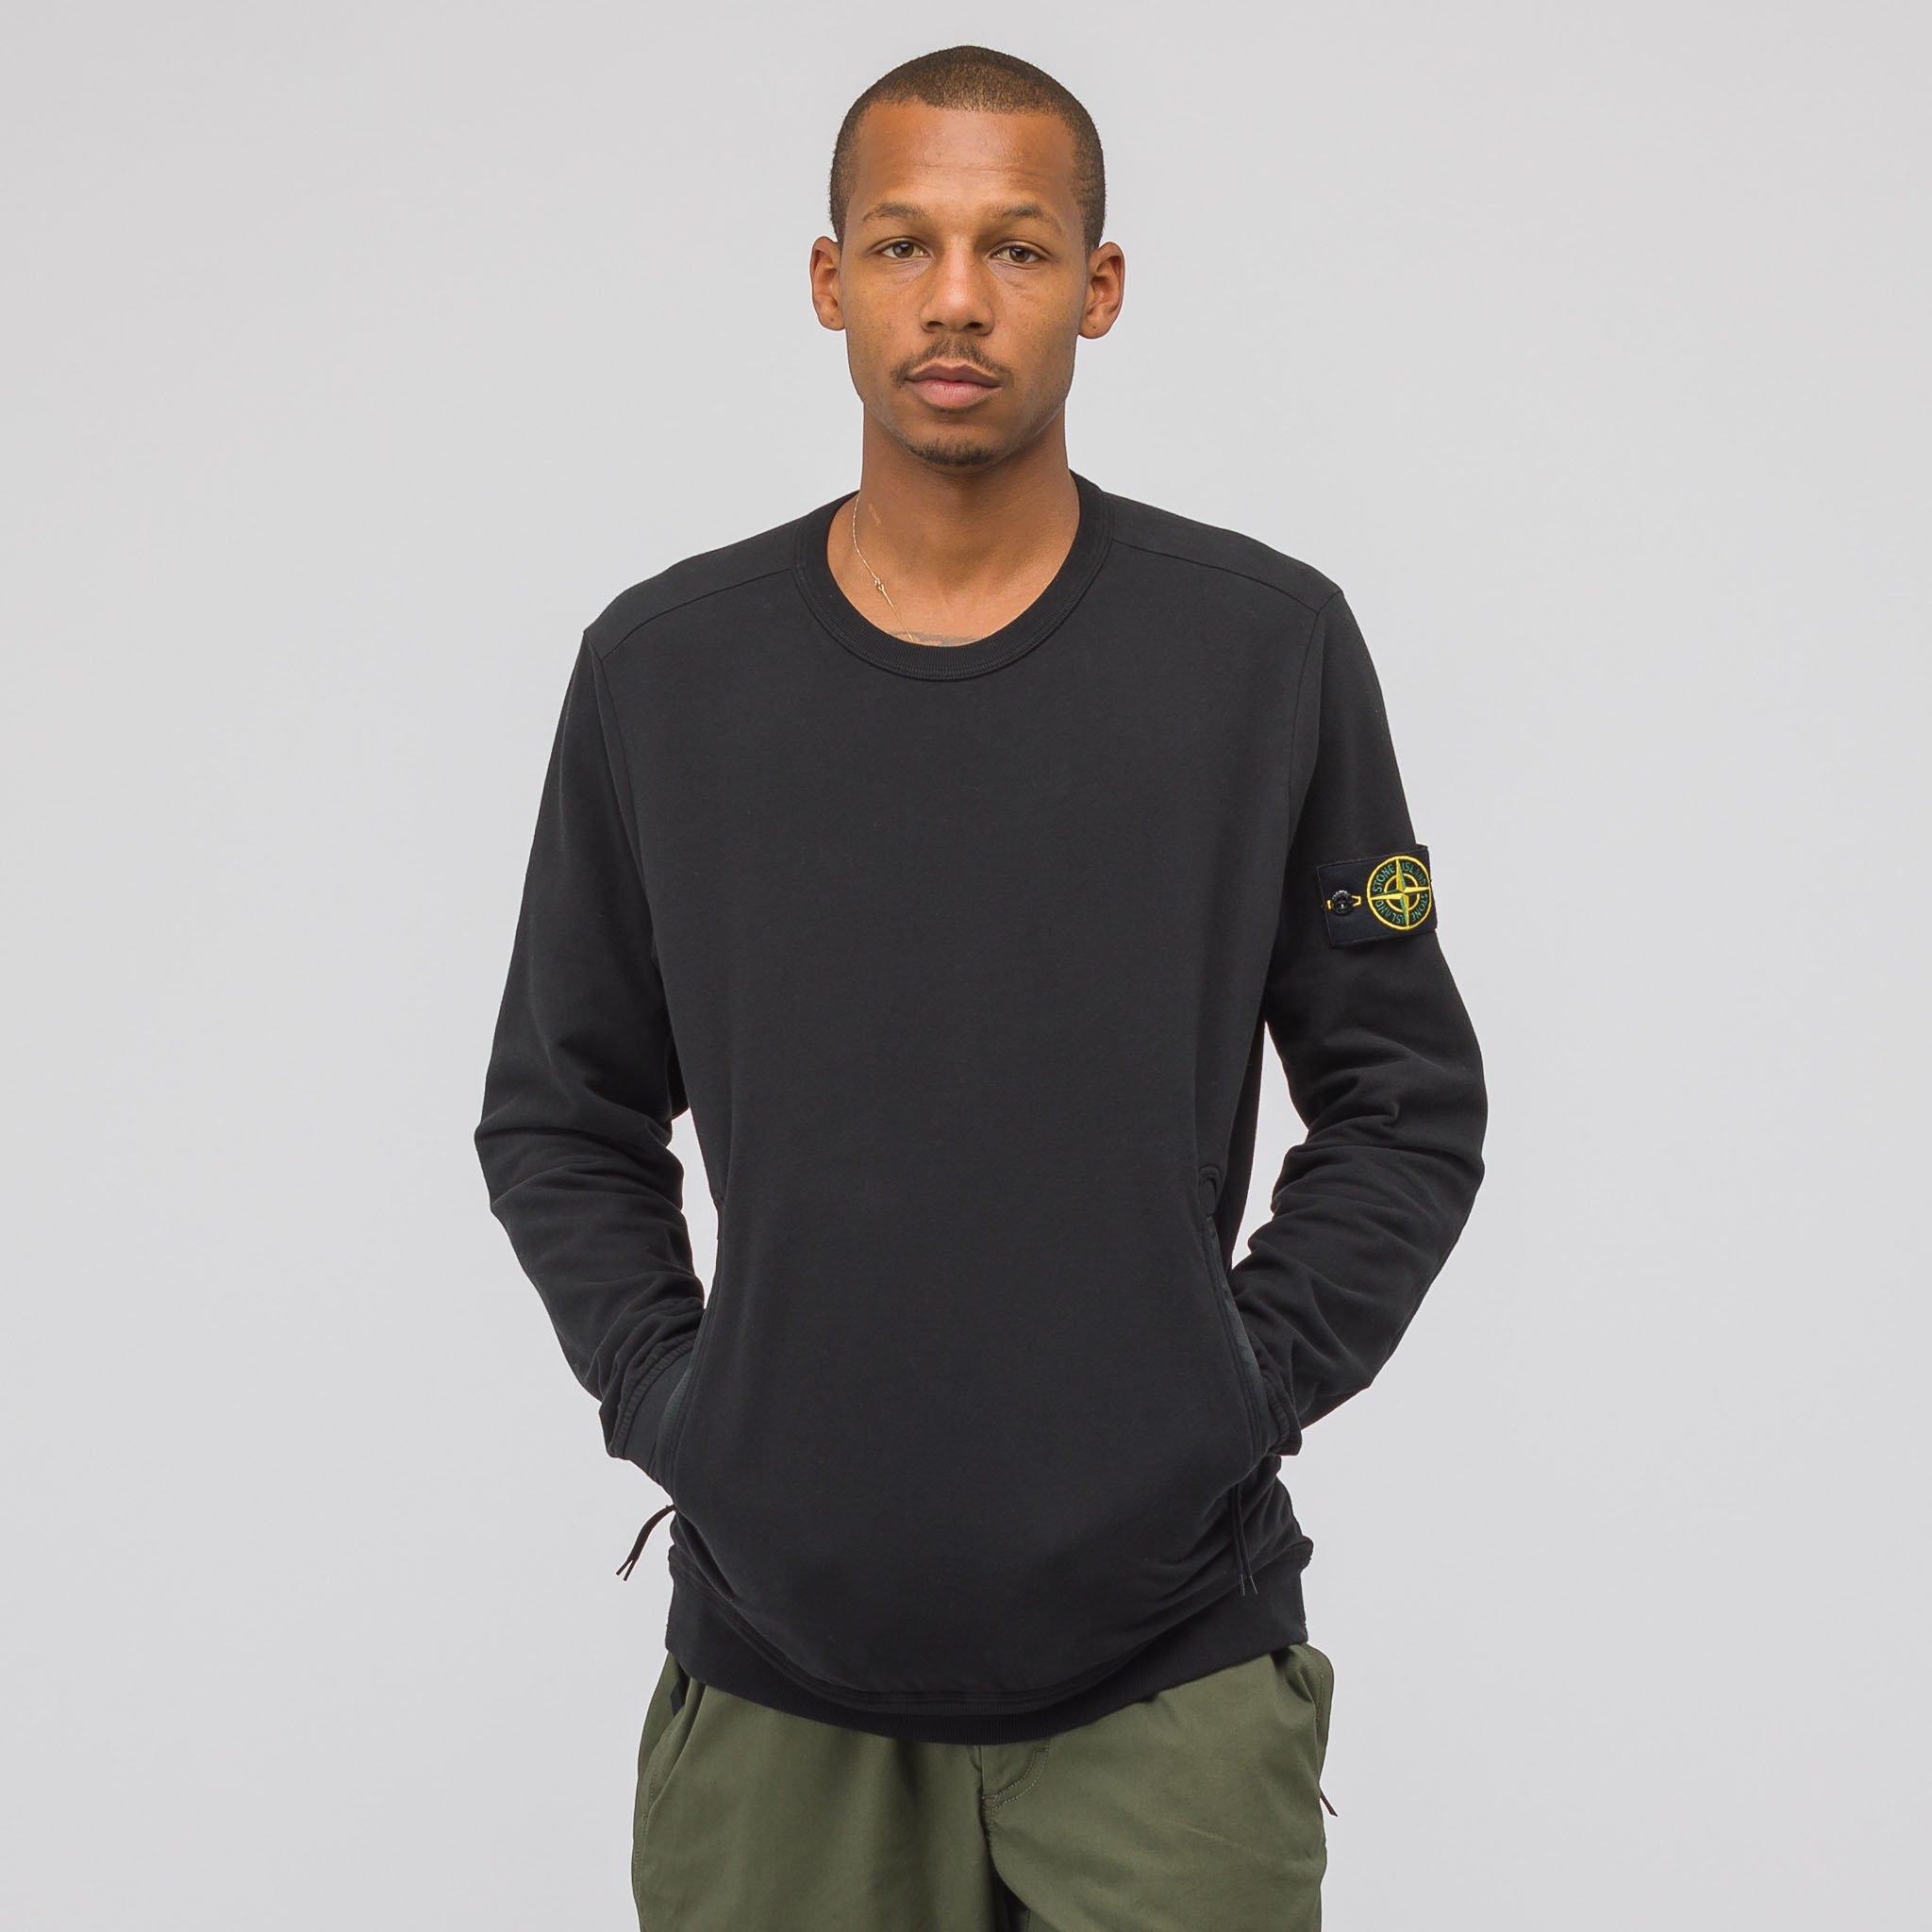 7f69a56131631 Very Goods | Stone Island 64438 Crewneck Sweatshirt in Black | Notre